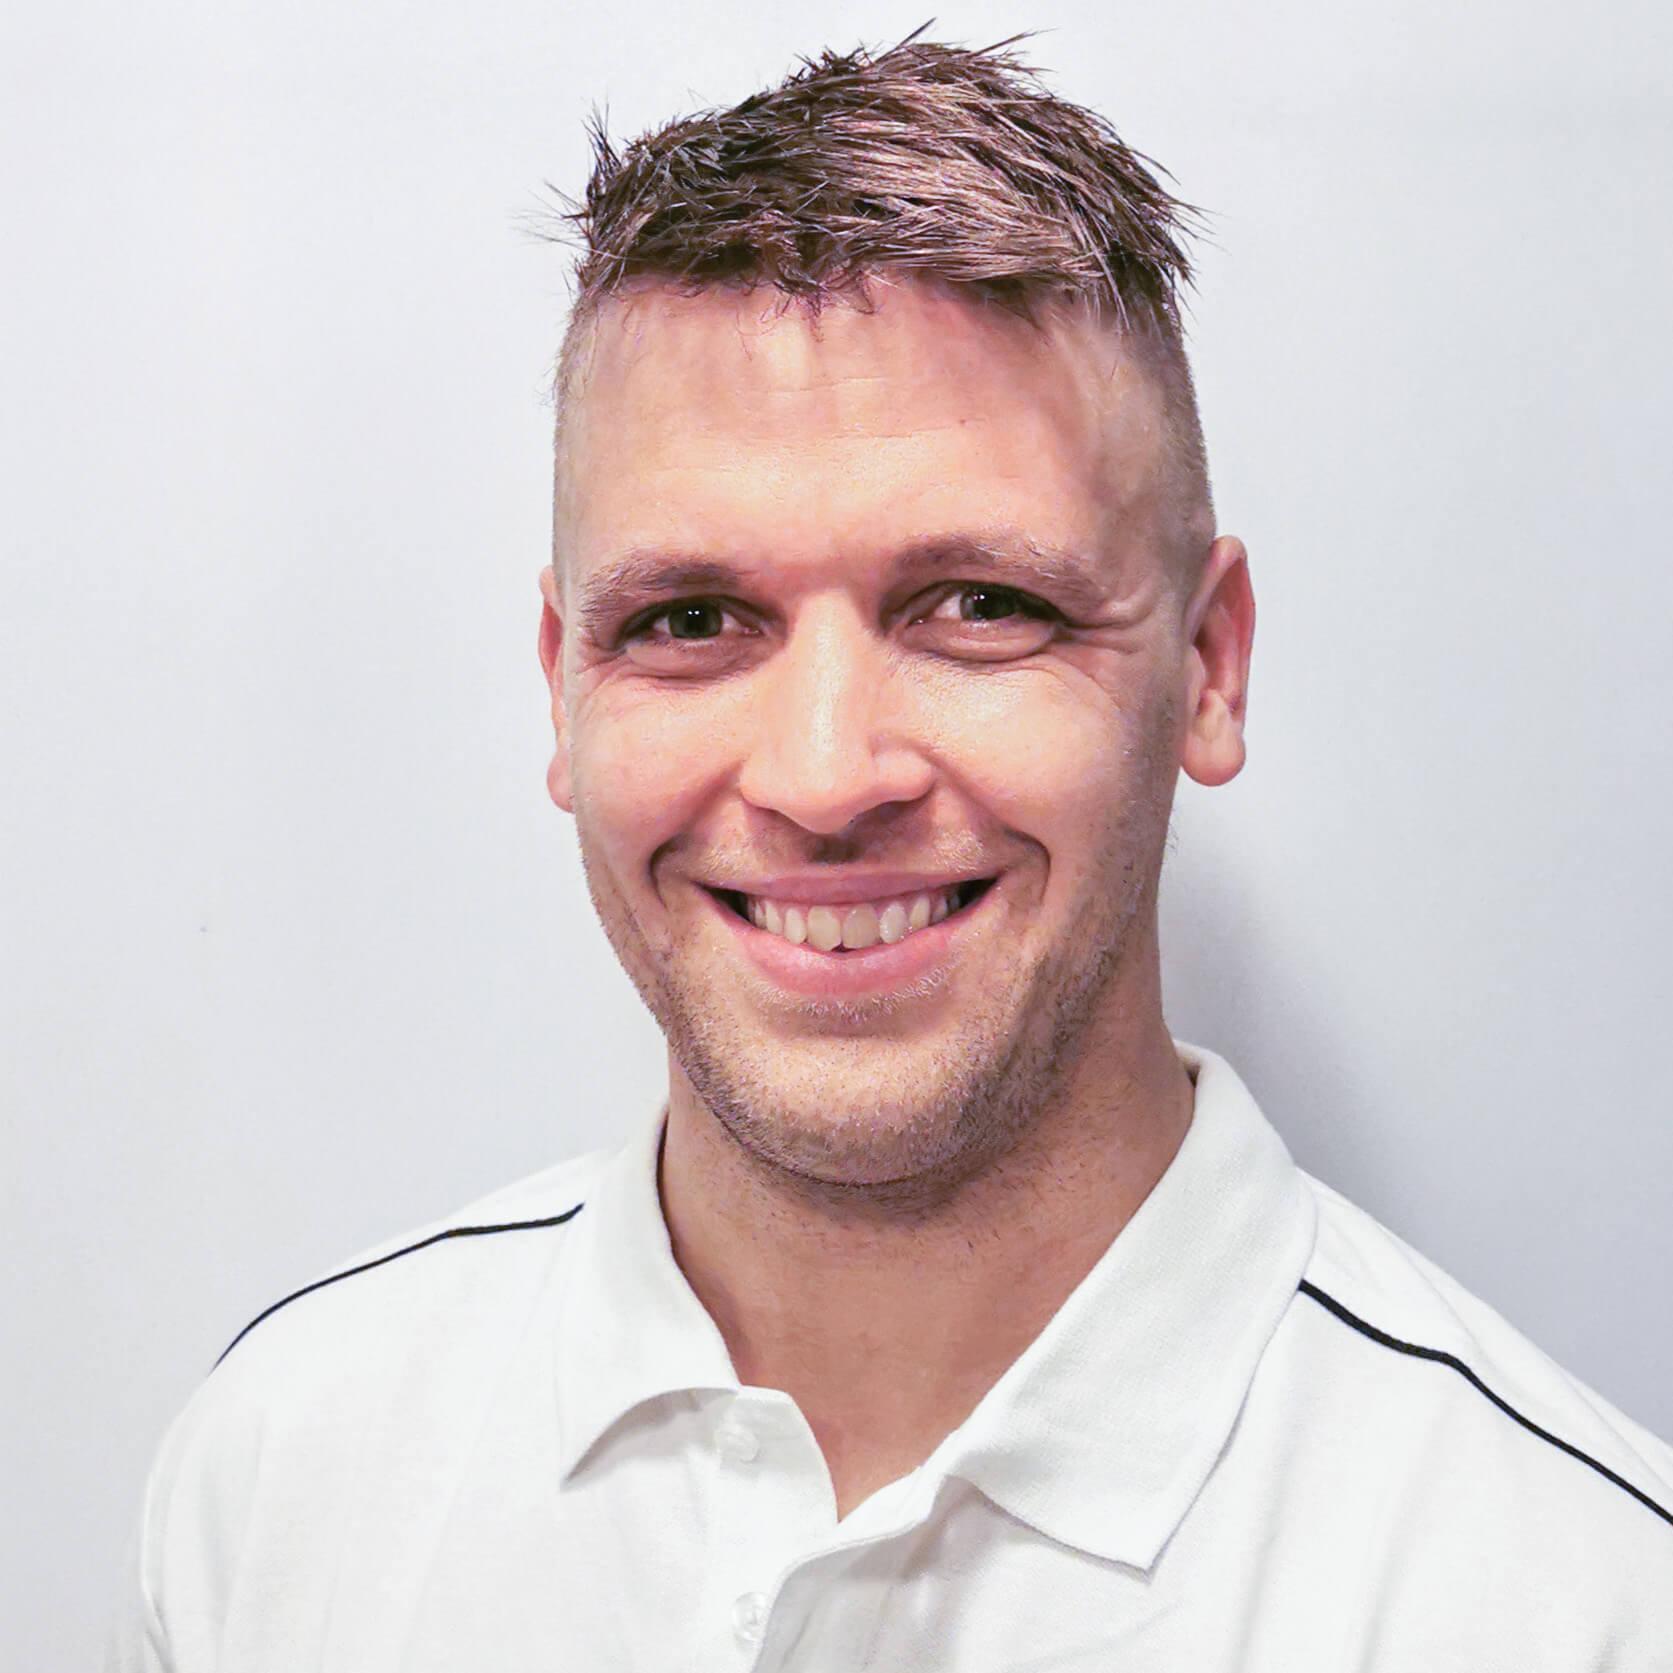 Daniel Opheim